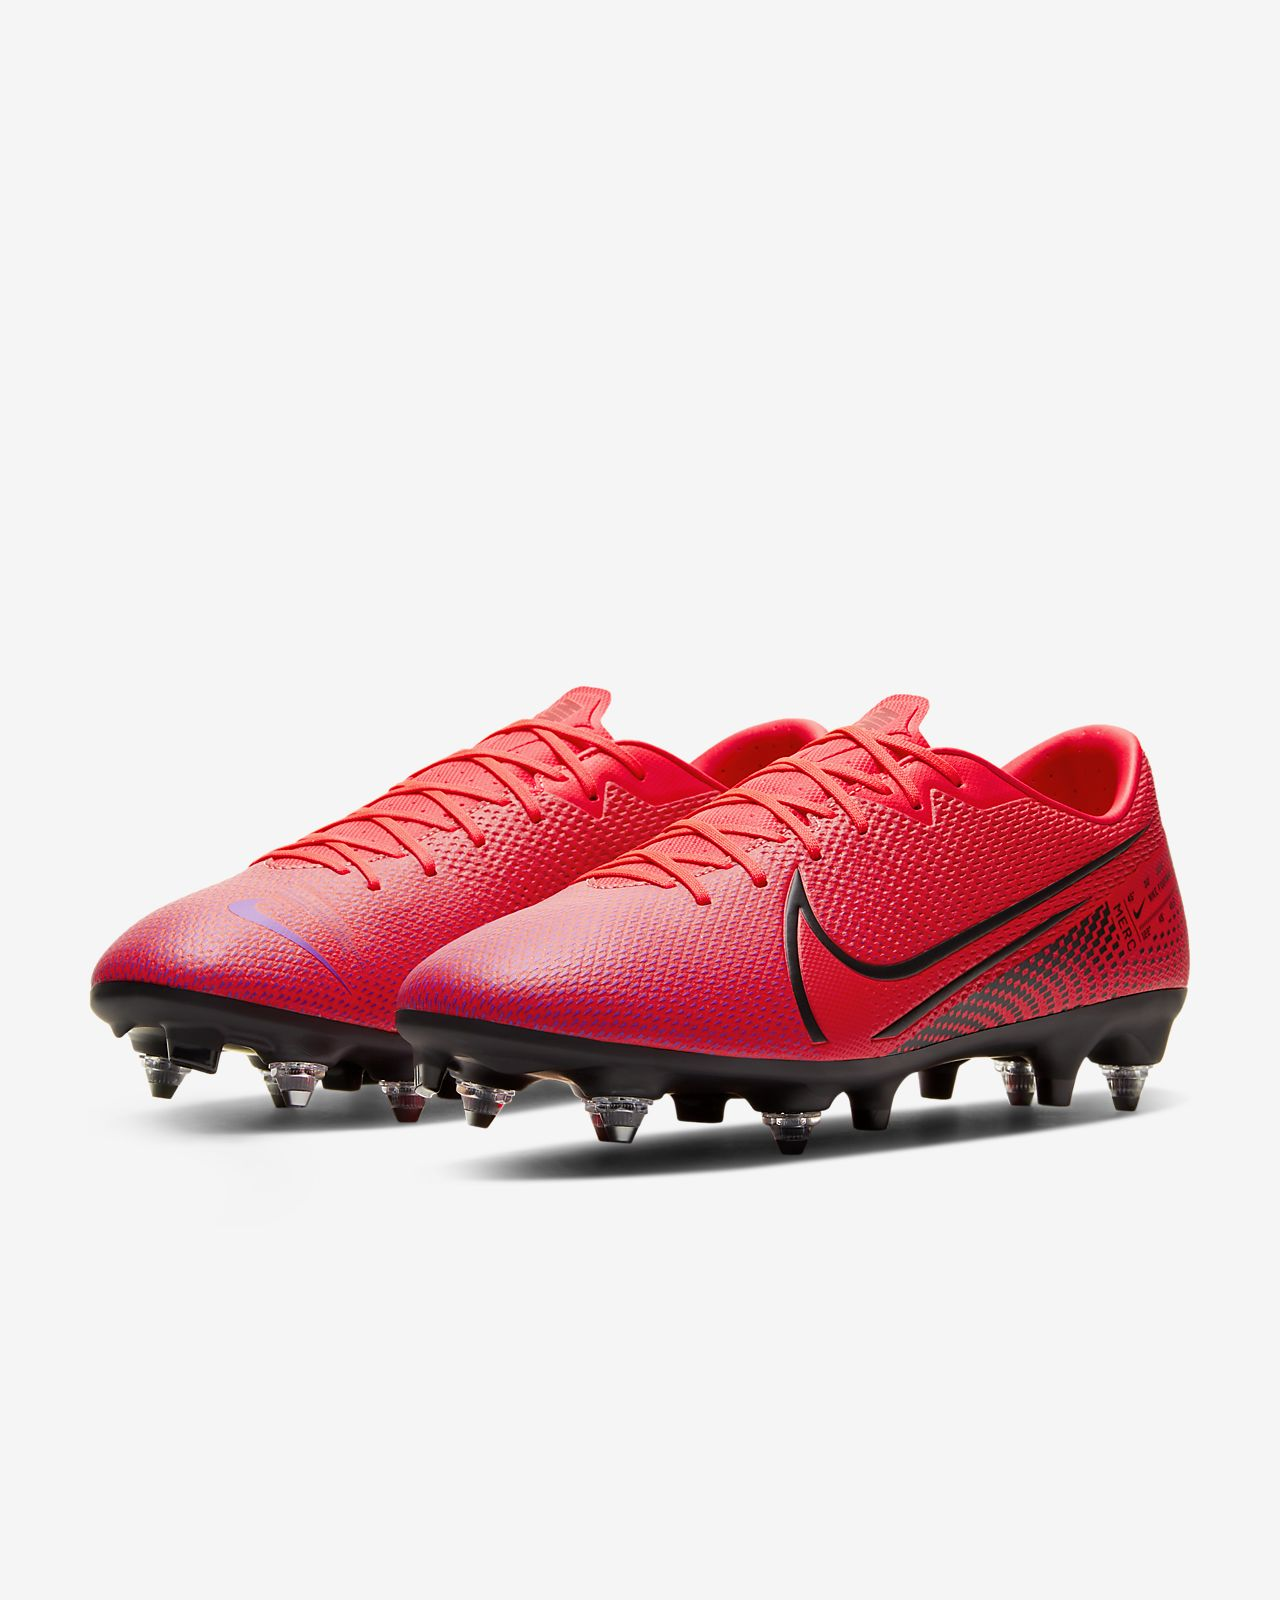 Nike Mercurial Vapor X Sg pro Cr7 BlackTotal Crimson